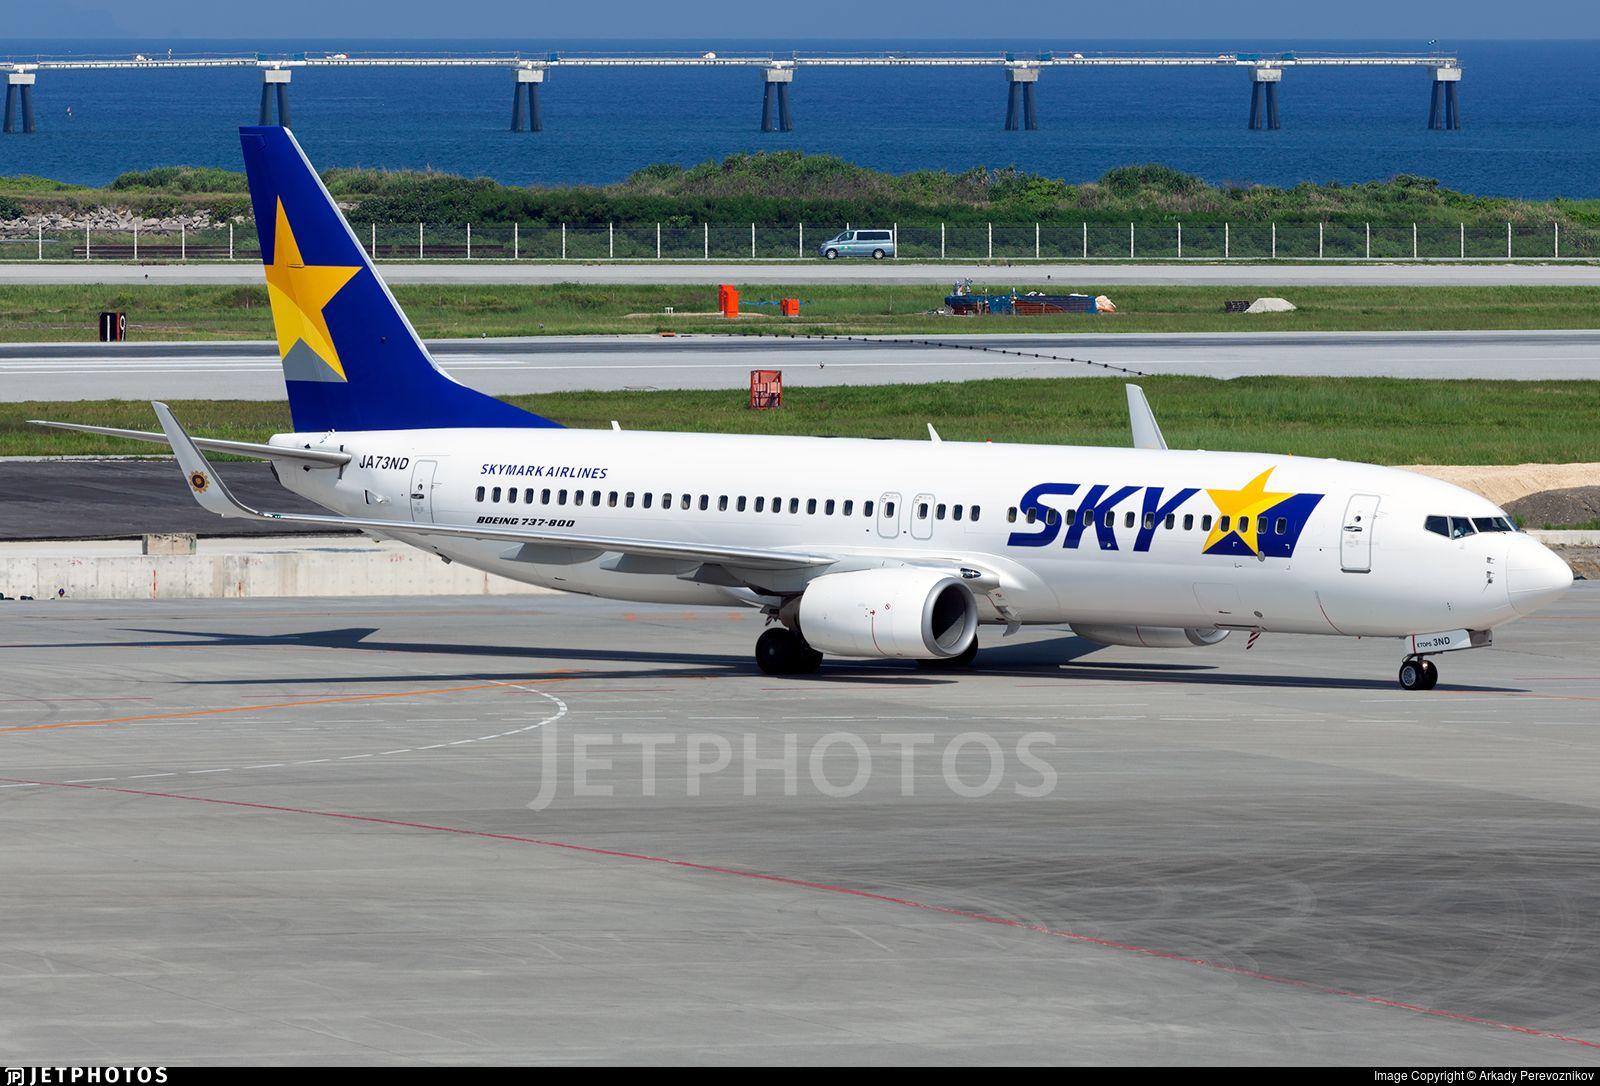 Airline Skymark Airlines Registration JA73ND Aircraft